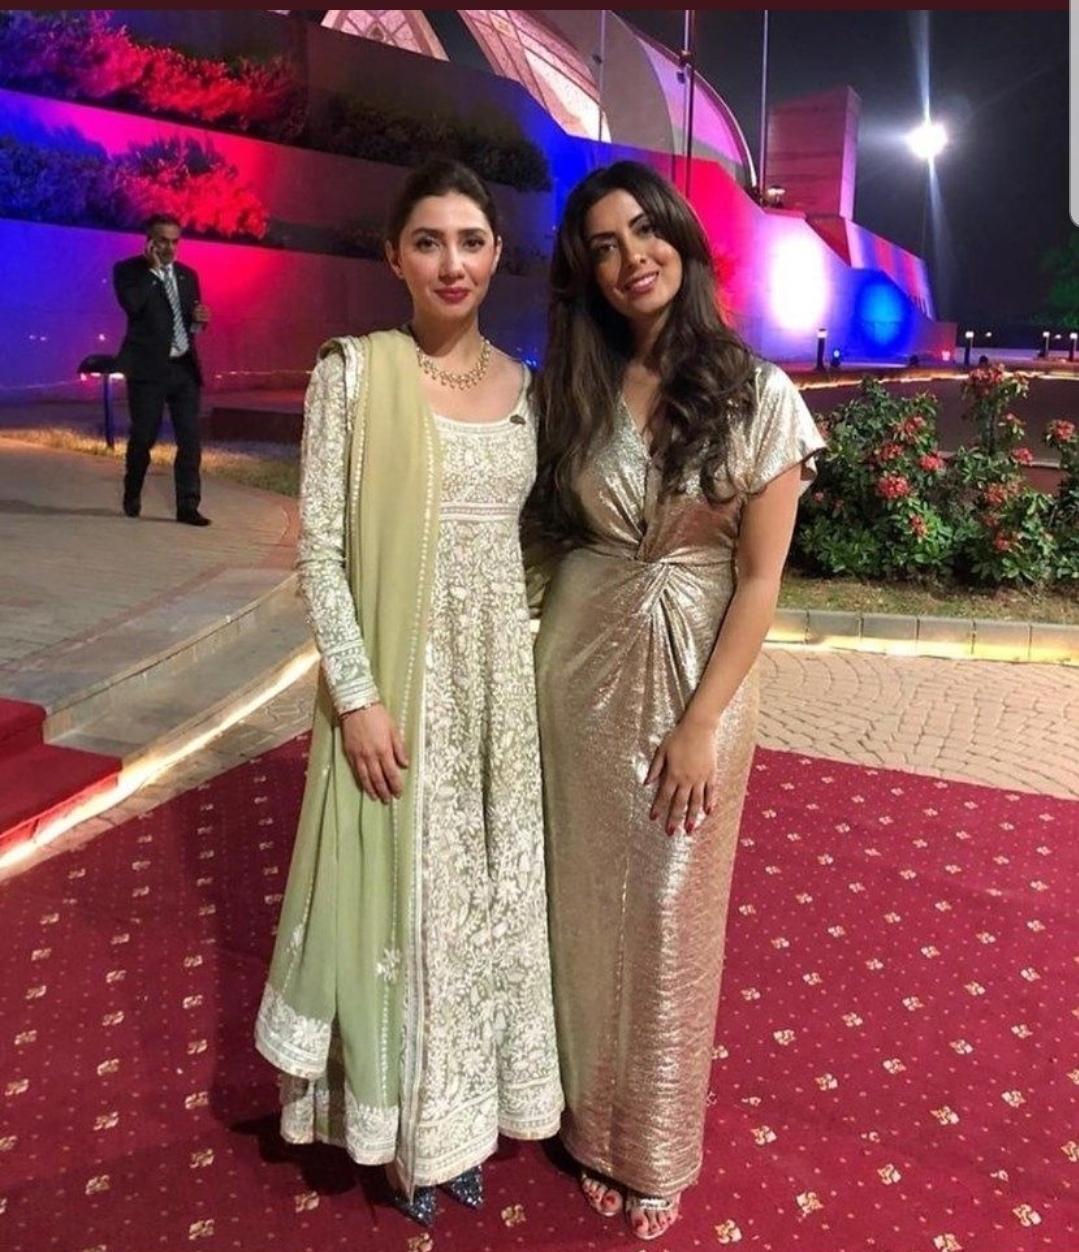 Kate Middleton and Prince William in Pakistan: Atif Aslam, Wasim Akram, Mehwish Hayat, Mahira Khan and Others Meet Royalty